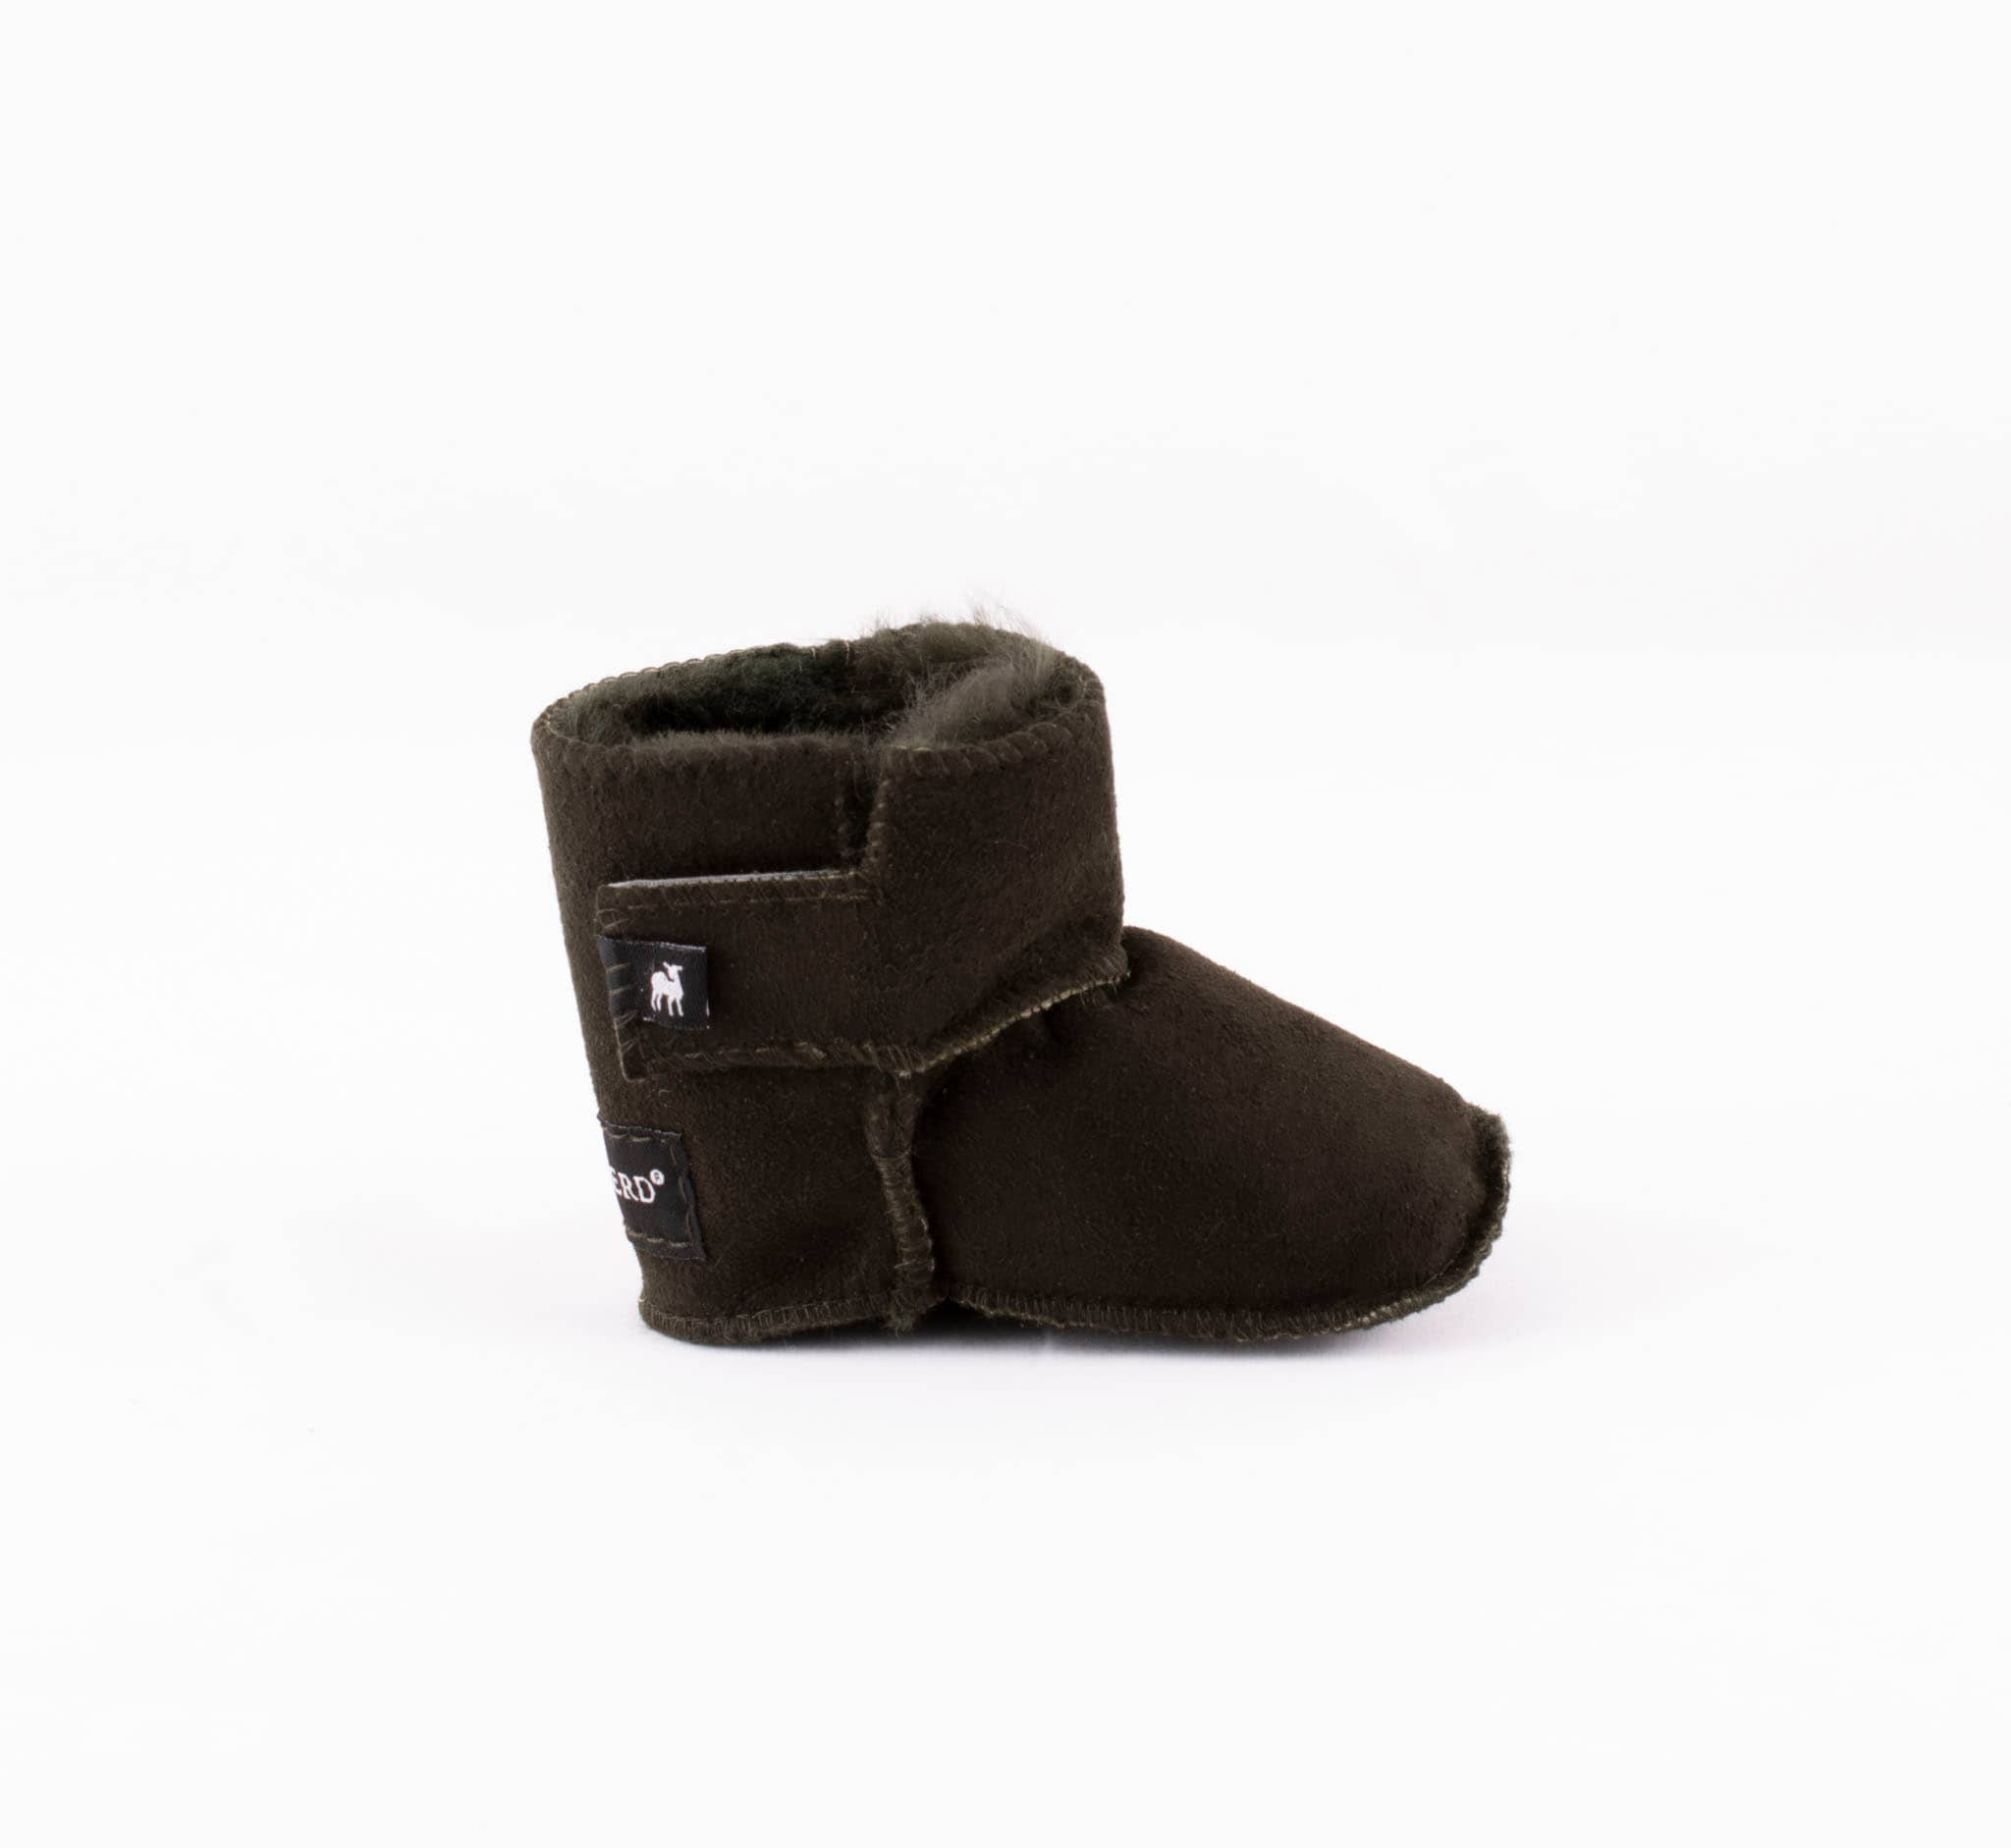 Borås baby slippers